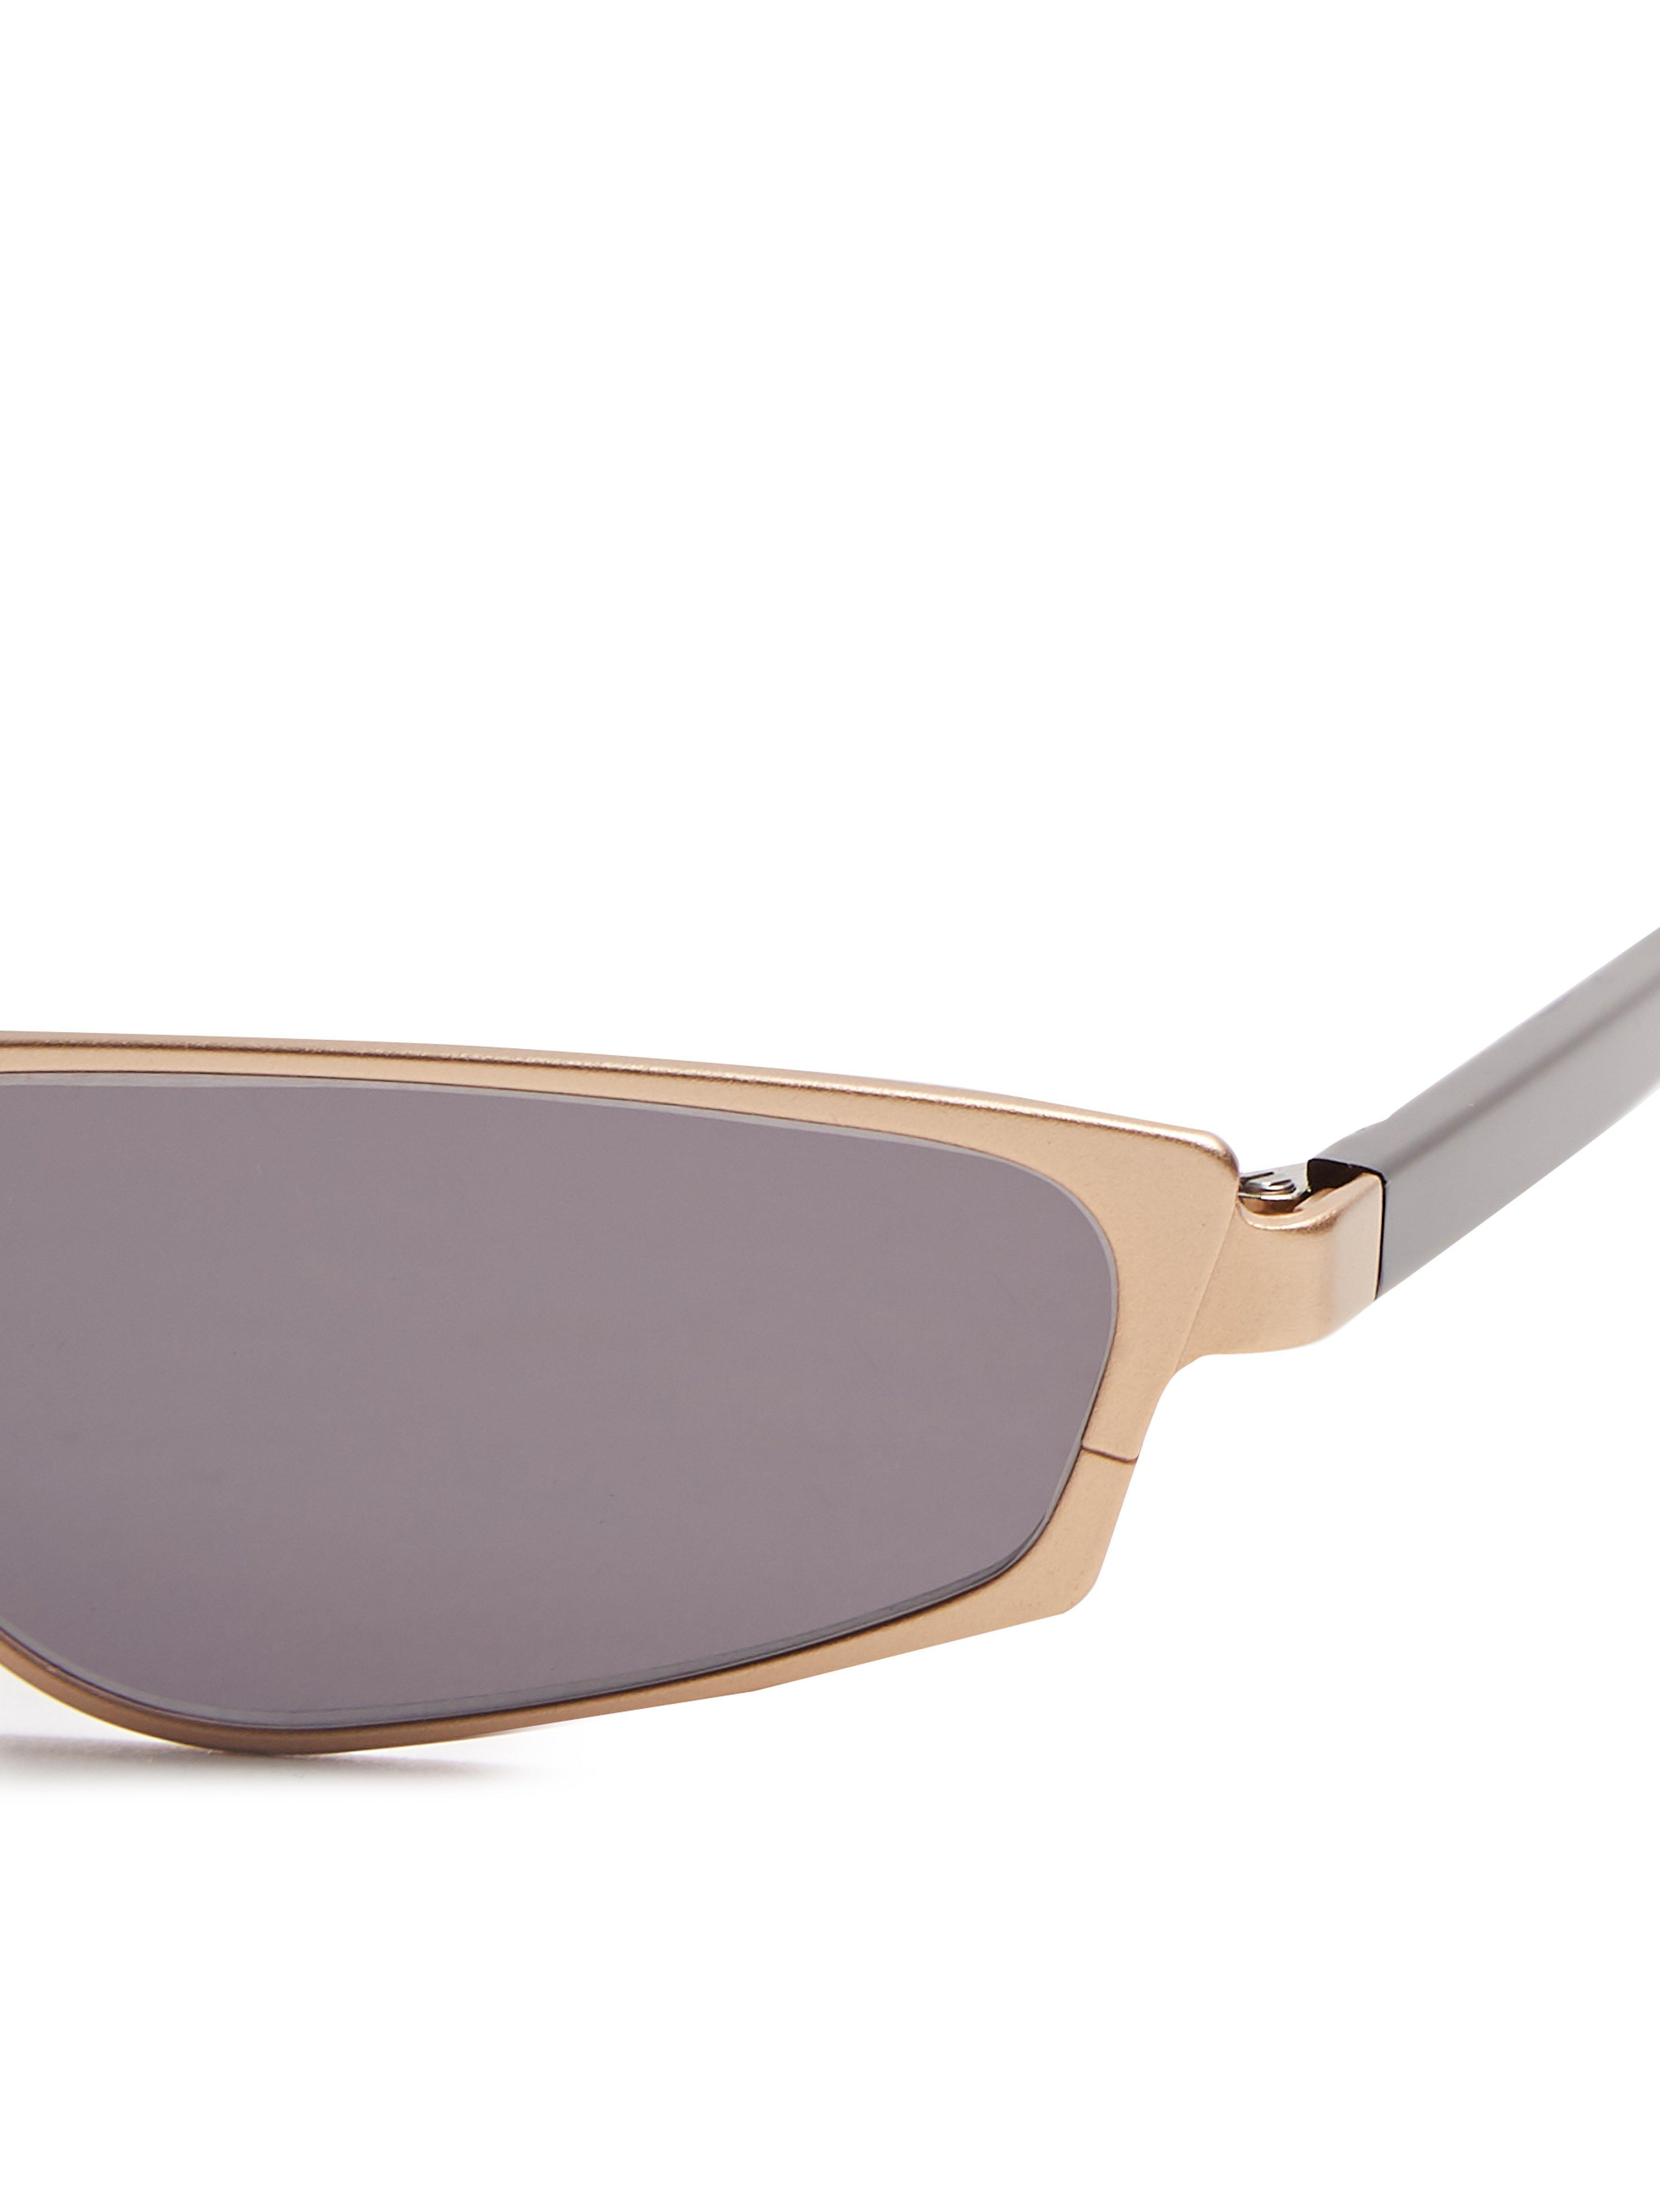 Andy Wolf Ojala Rectangular Metal Sunglasses in Brown for Men